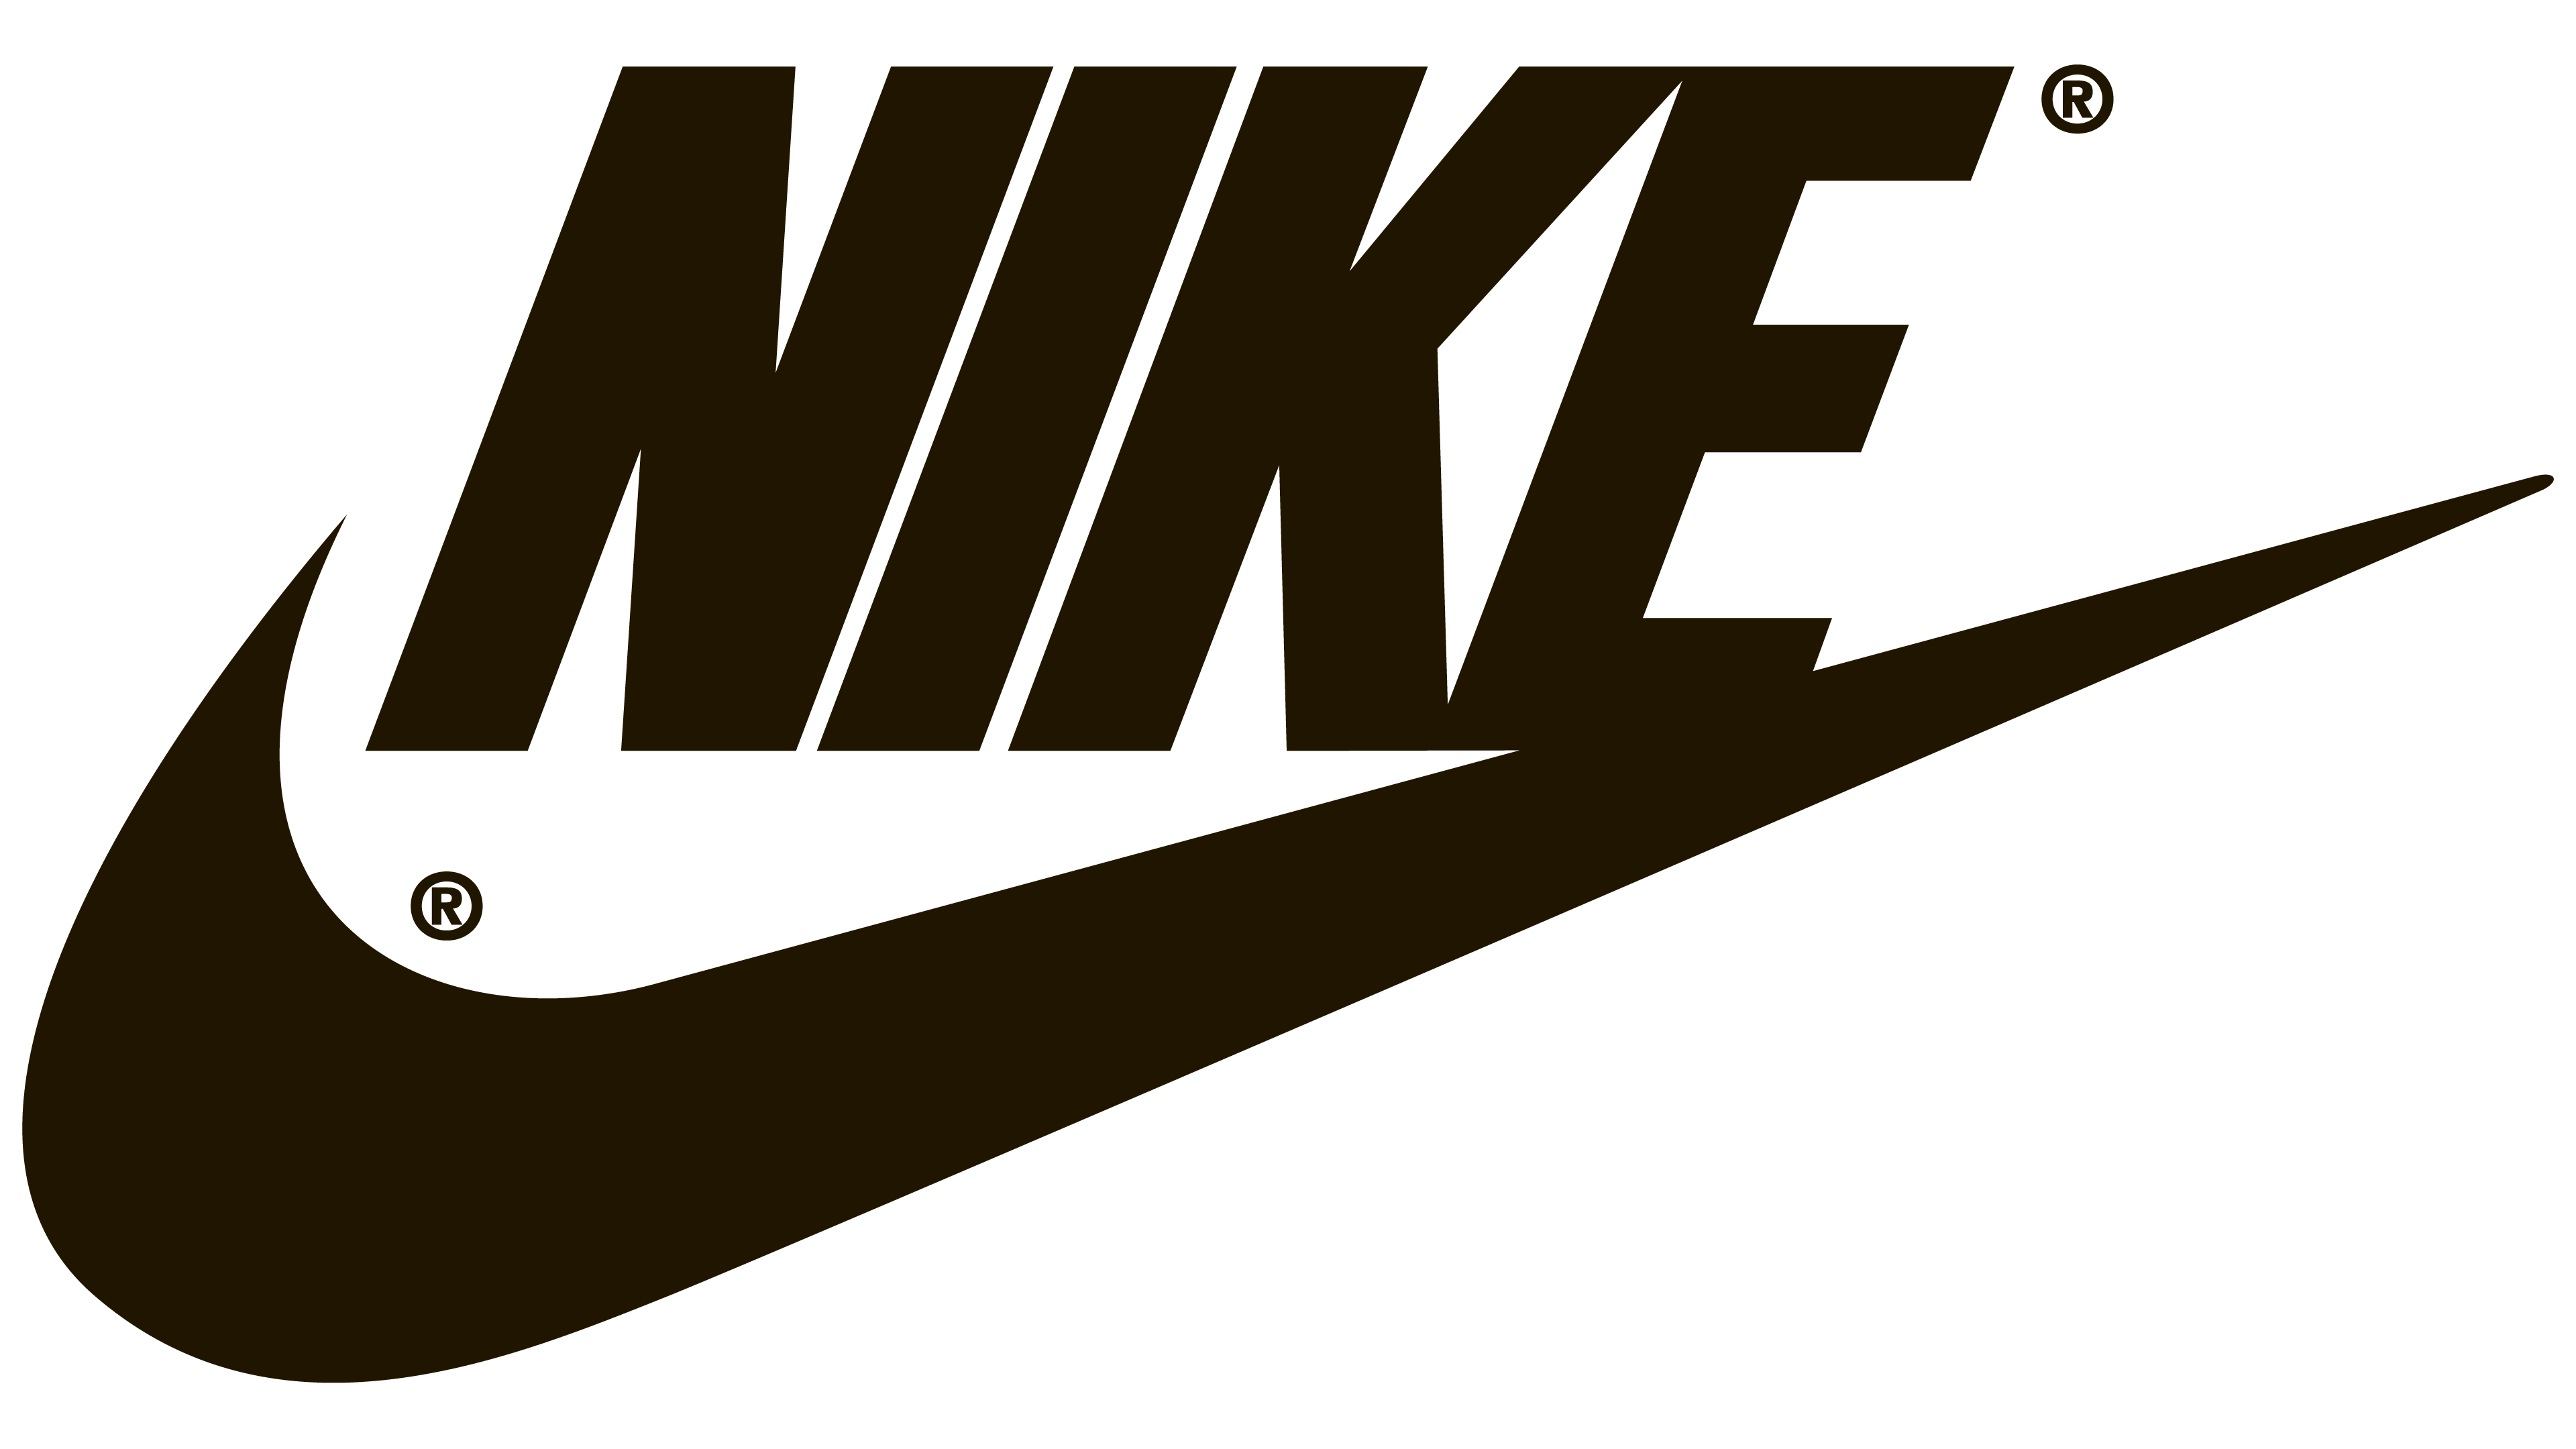 Zapatillas de running NIKE NIKE REVOLUTION 4 EU color